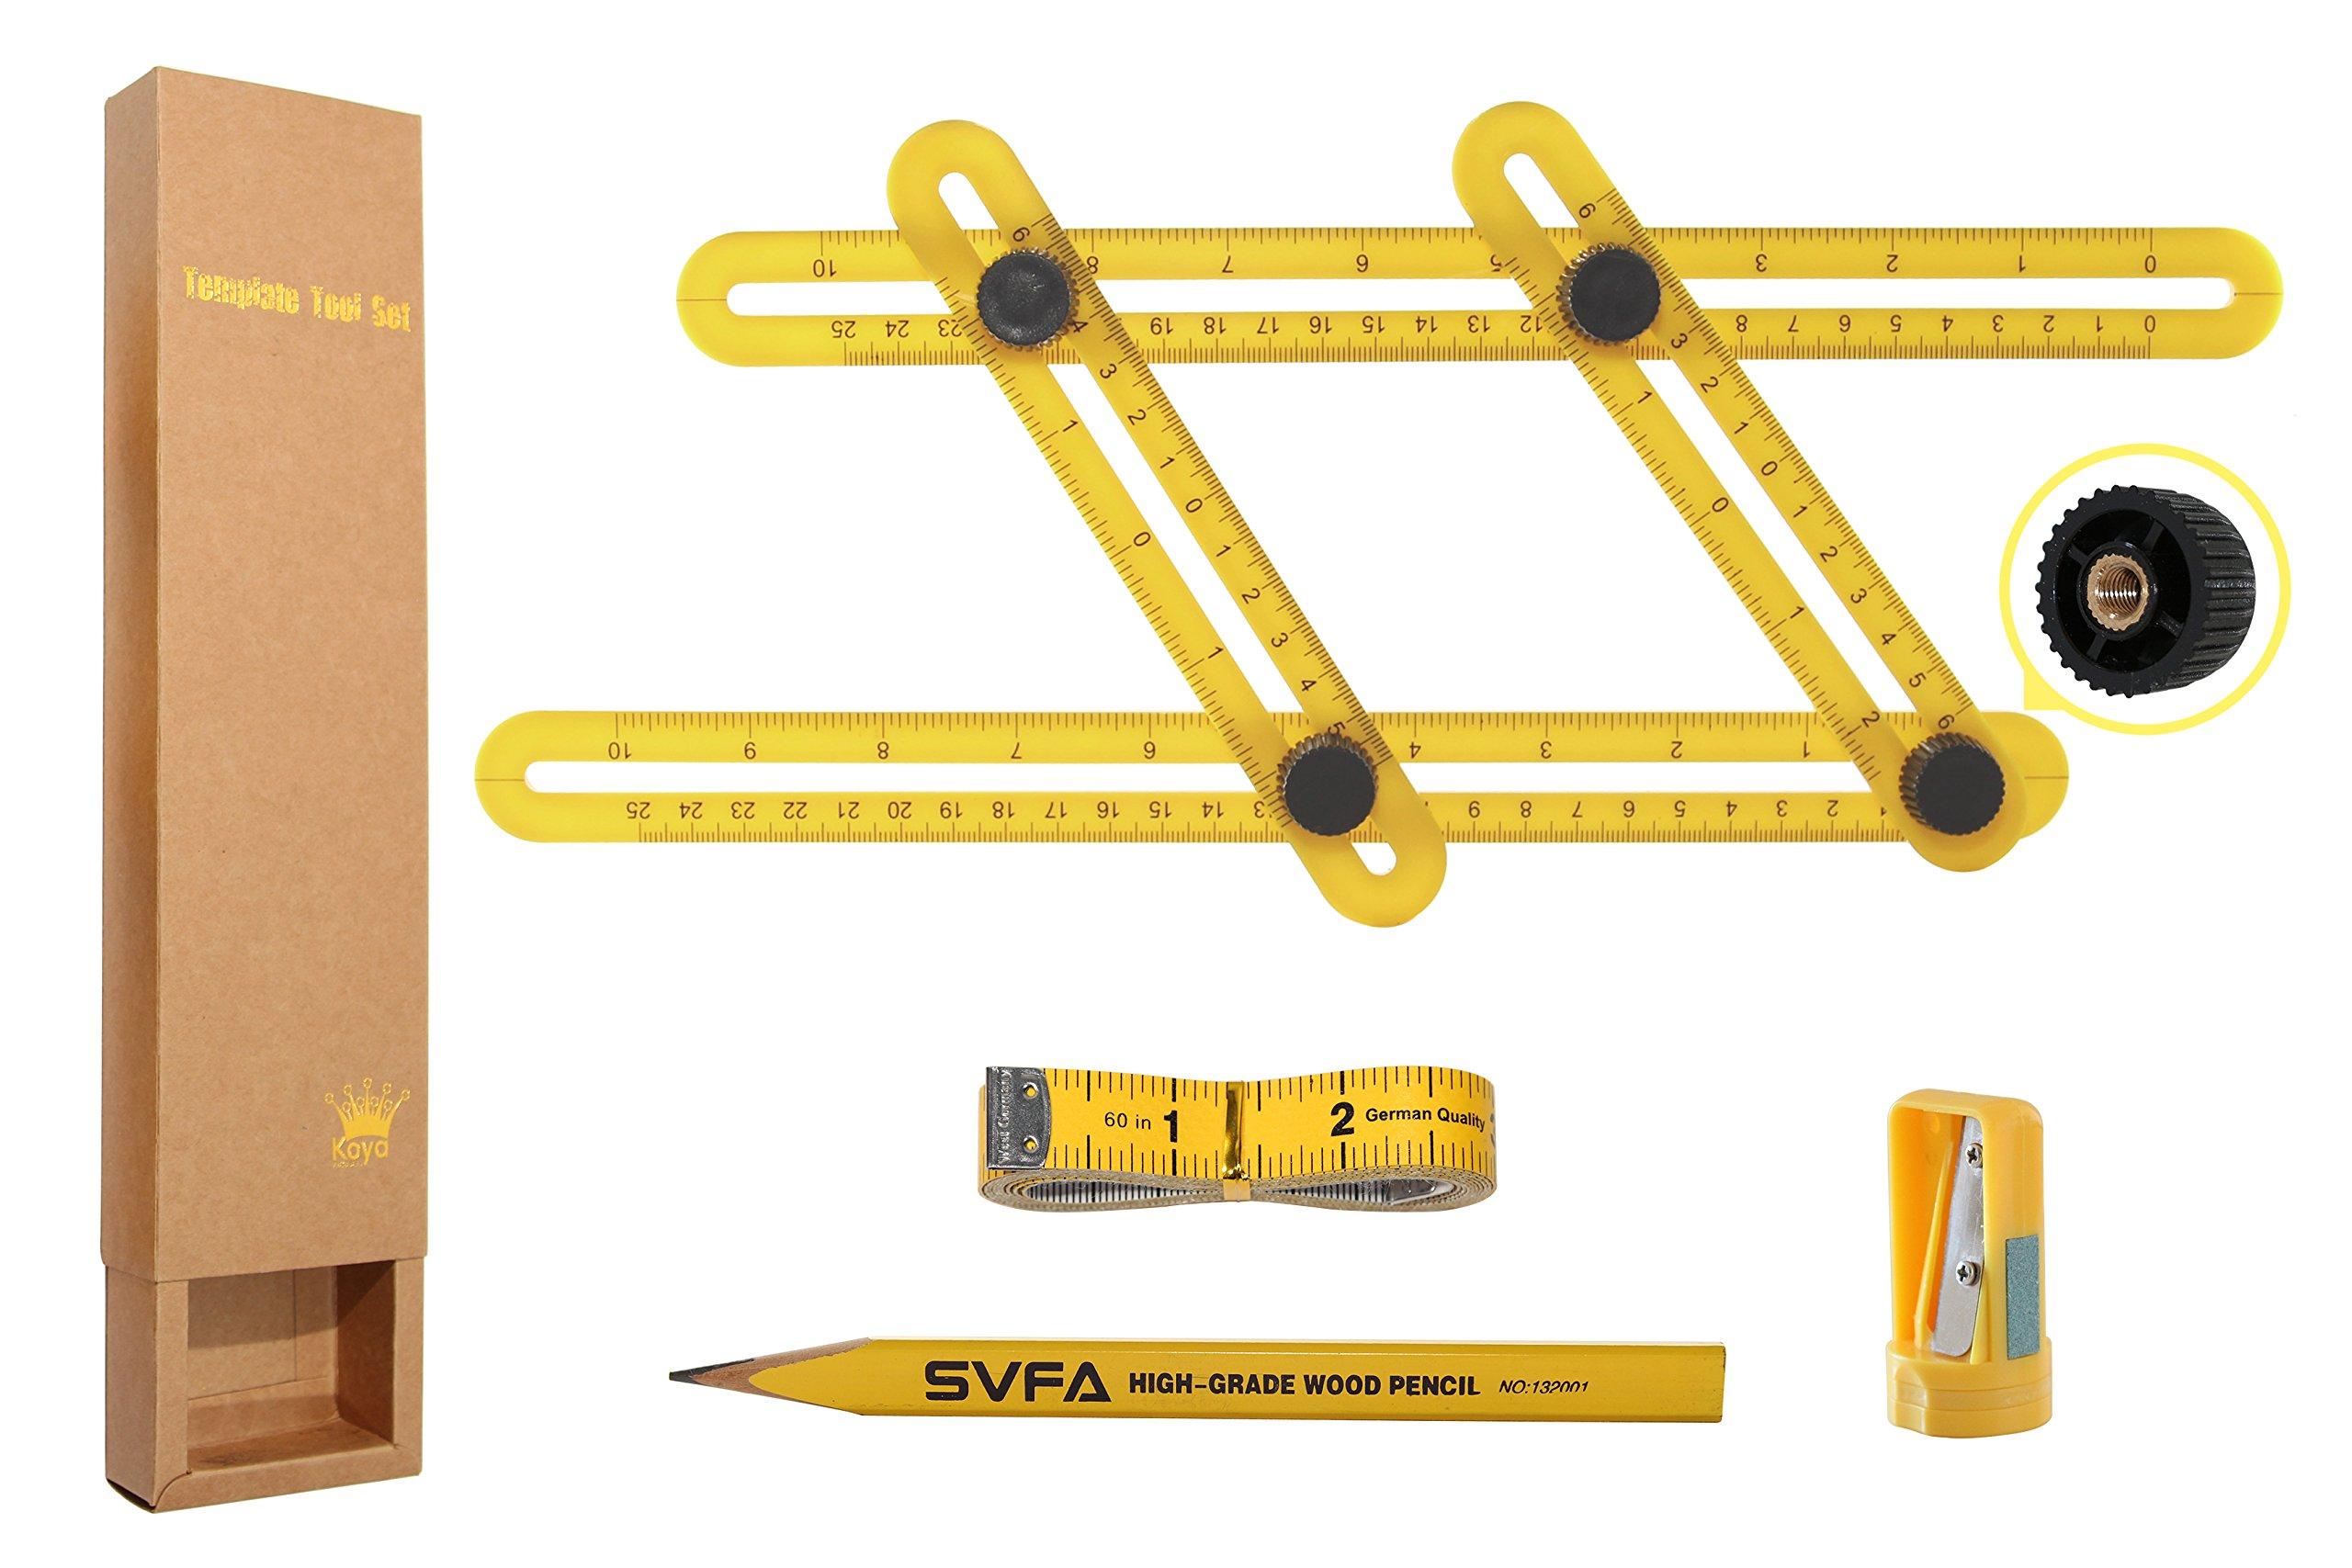 Multi Angle Measuring Template Tool Set - Premium Universal Angularizer Ruler - Perfect For Builders Craftsmen Handymen Carpenters DIY & GREAT GIFT (Yellow)